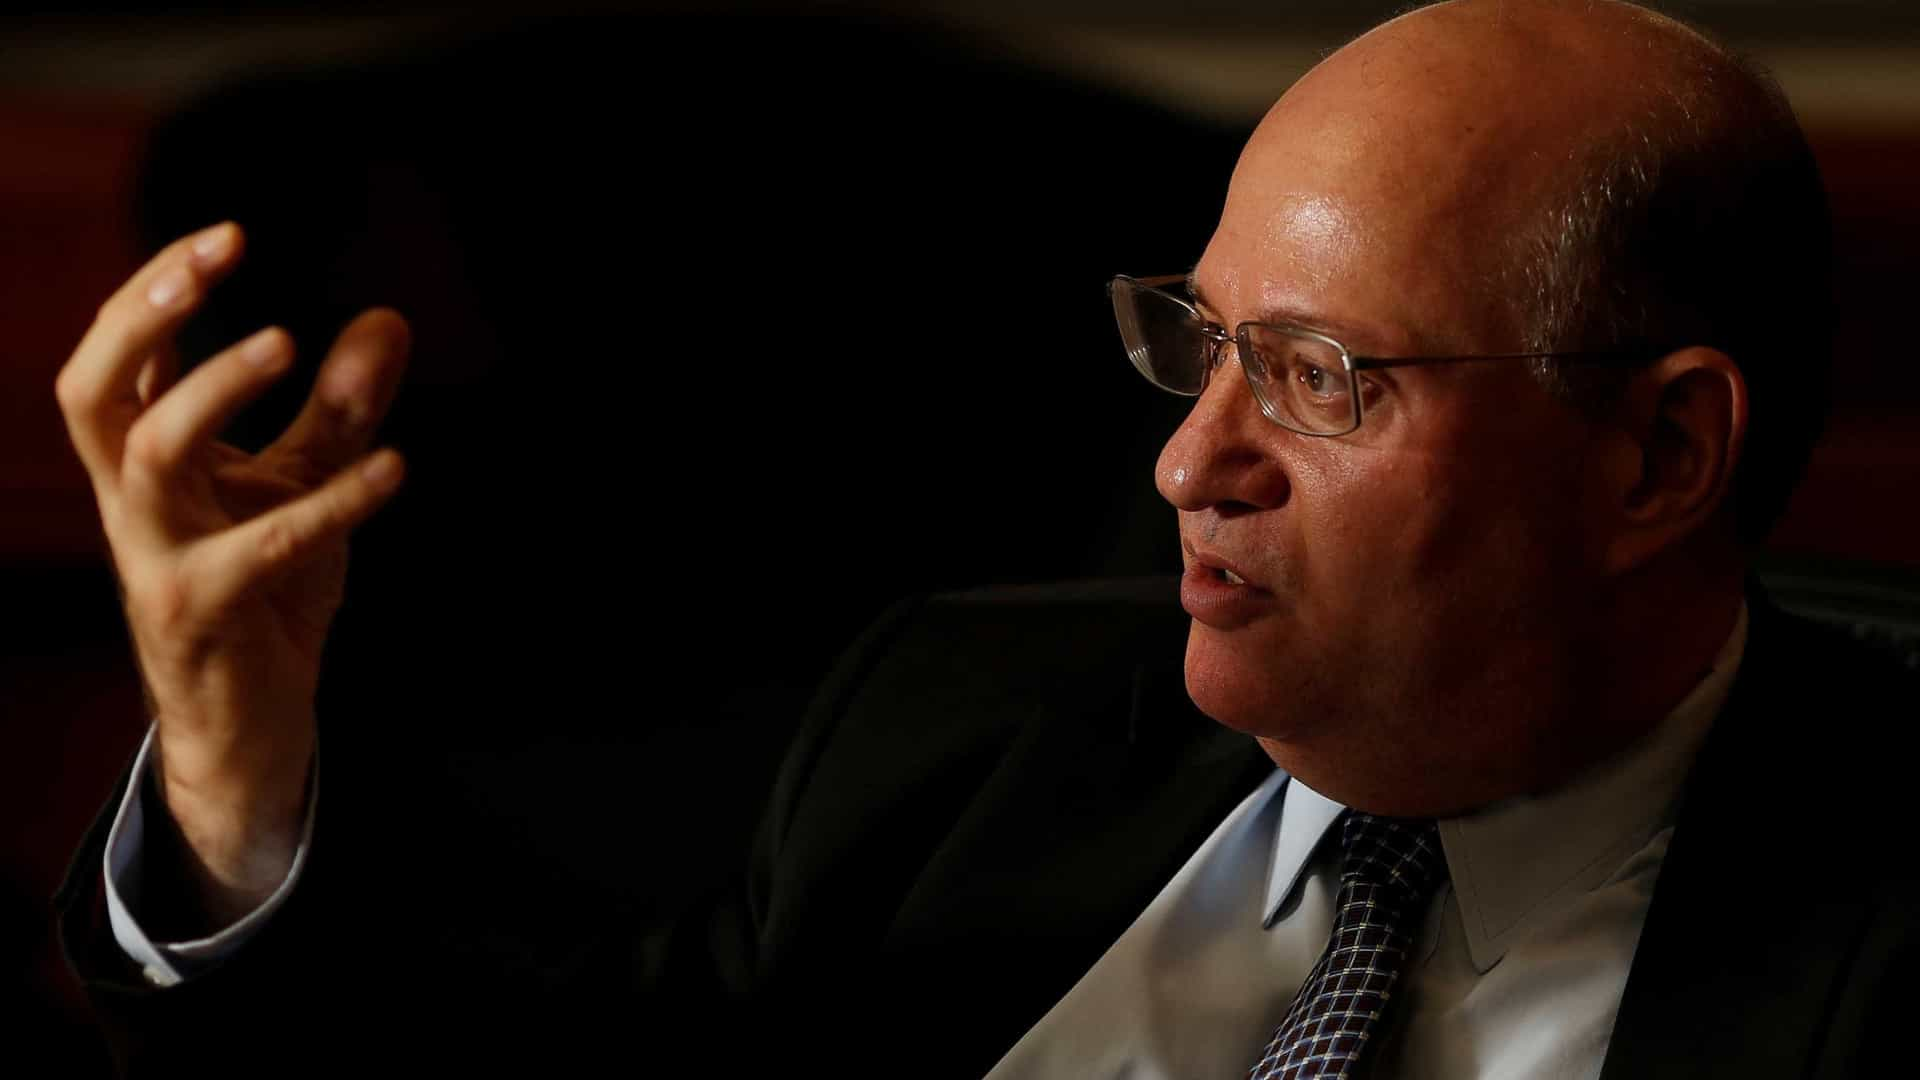 Em Israel, Ilan Goldfajn defende reformas e ajustes fiscais